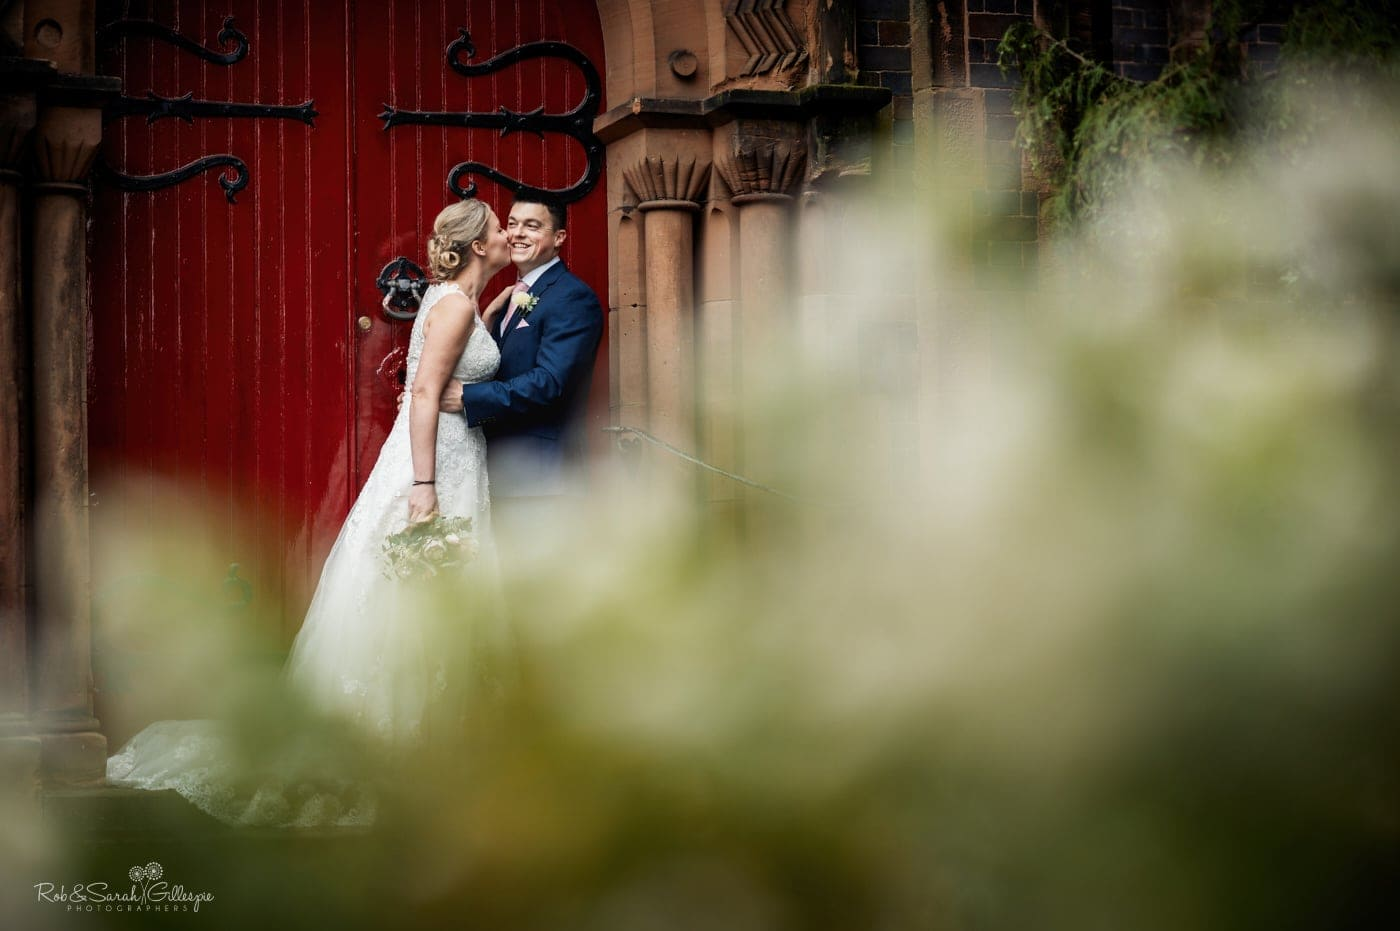 Bride and groom couple photos outside church